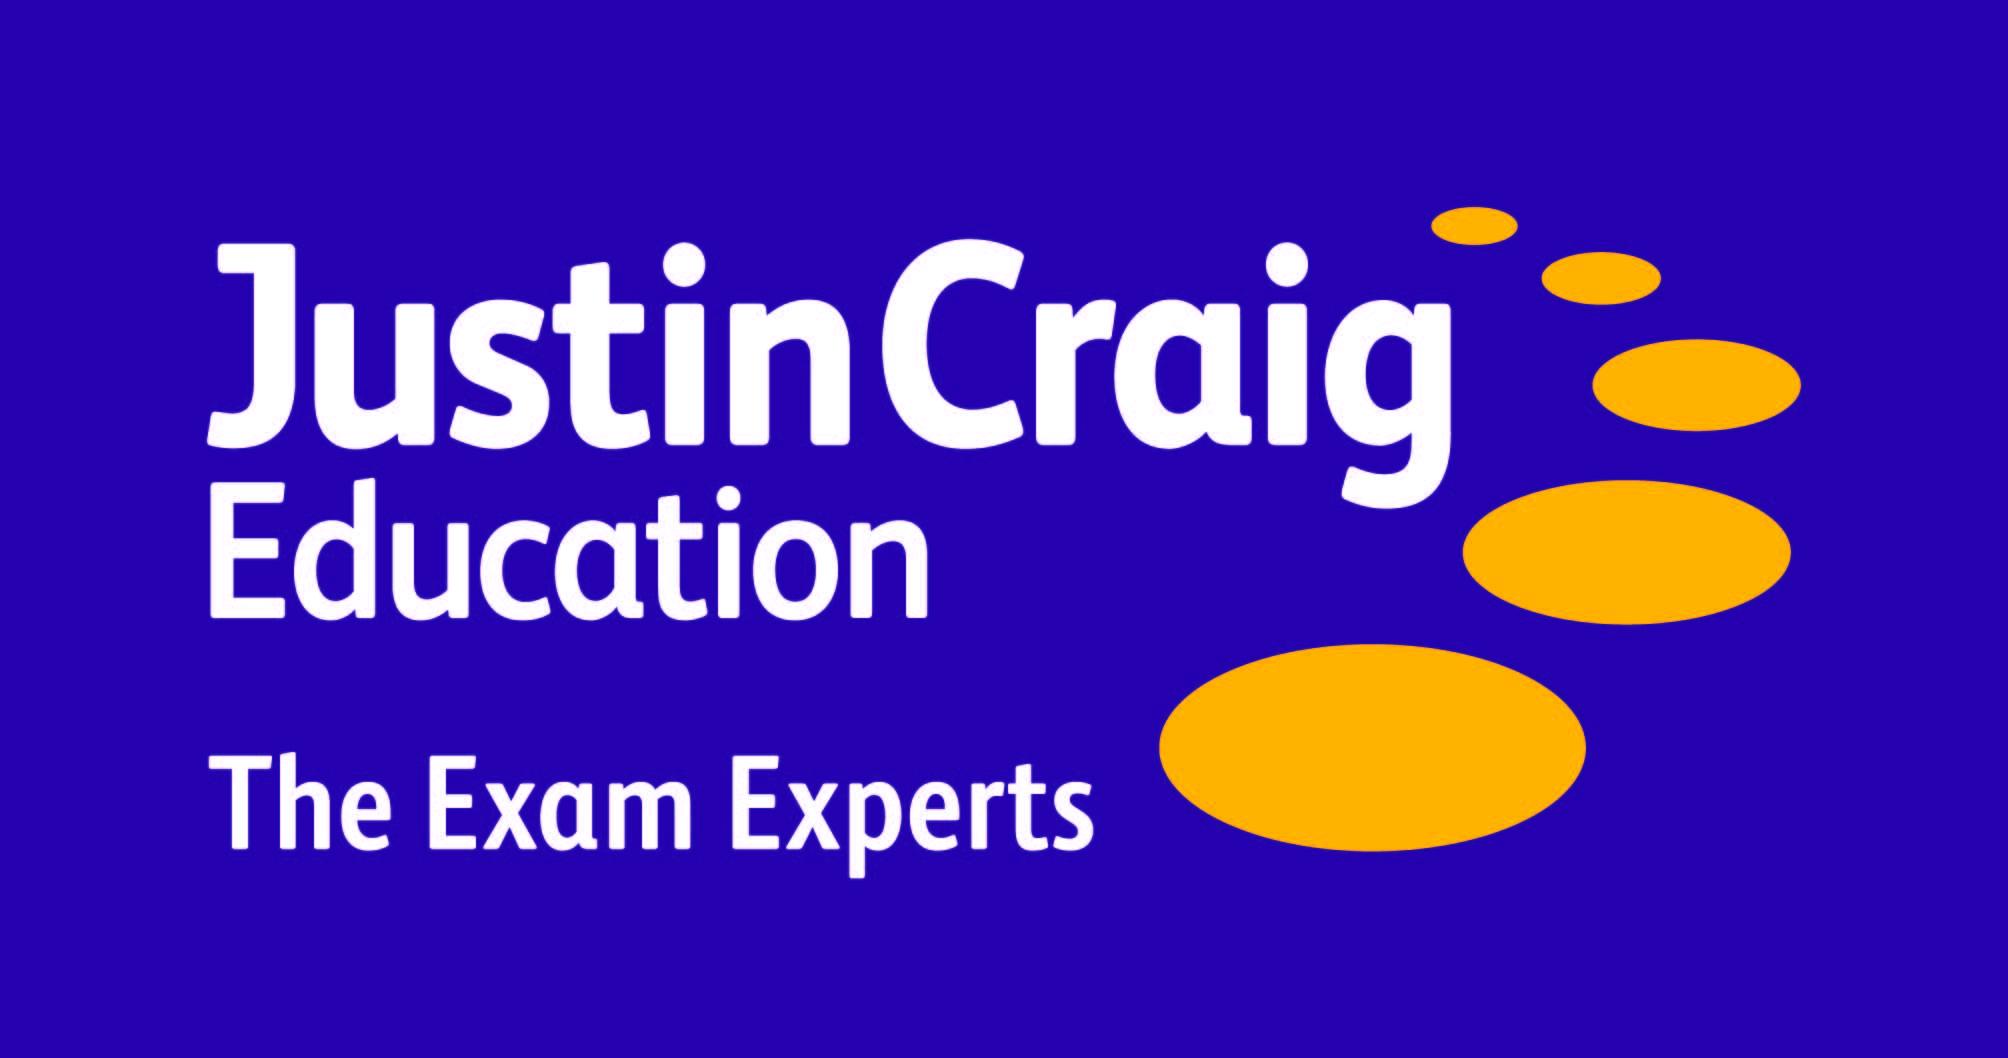 Justin Craig Education Logo Purple.jpg